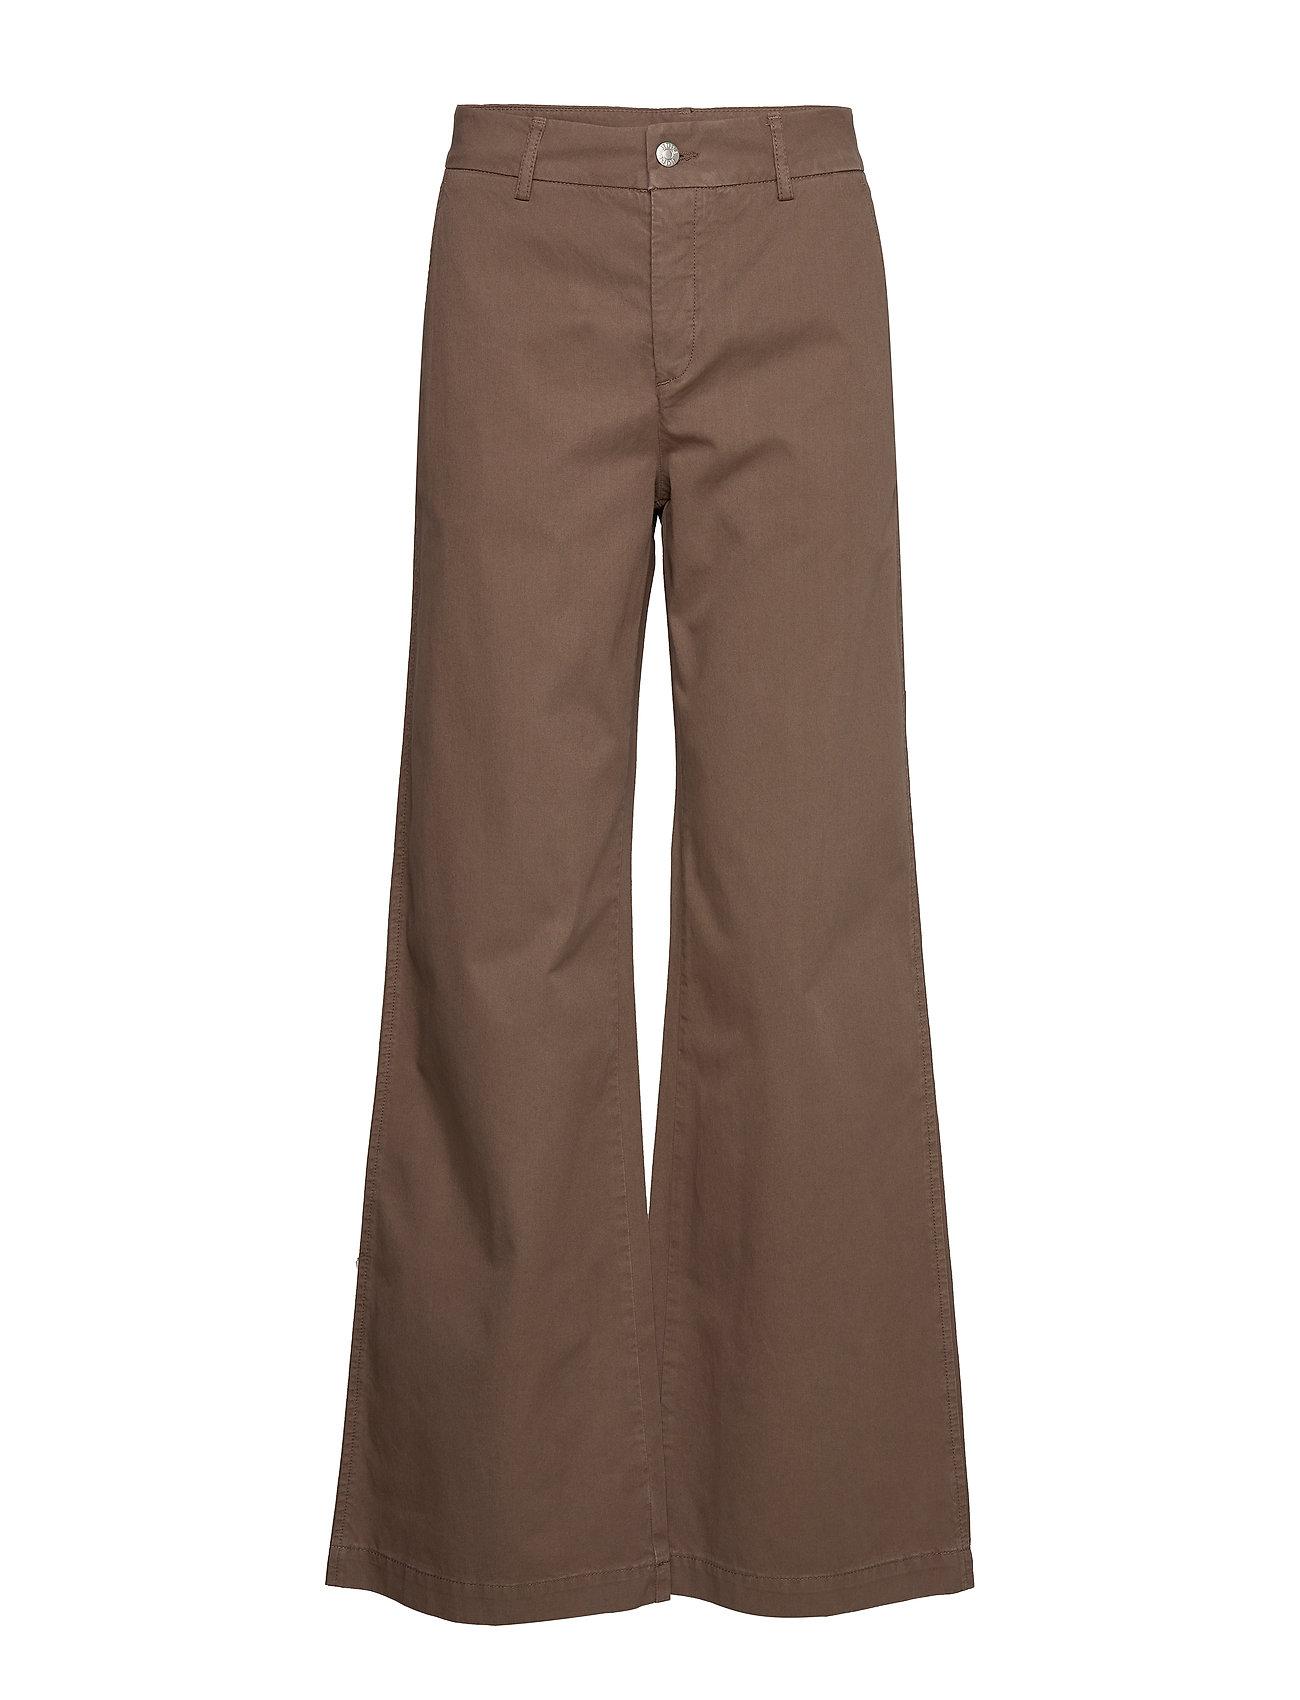 Hope Ease Trousers - KHAKI BROWN